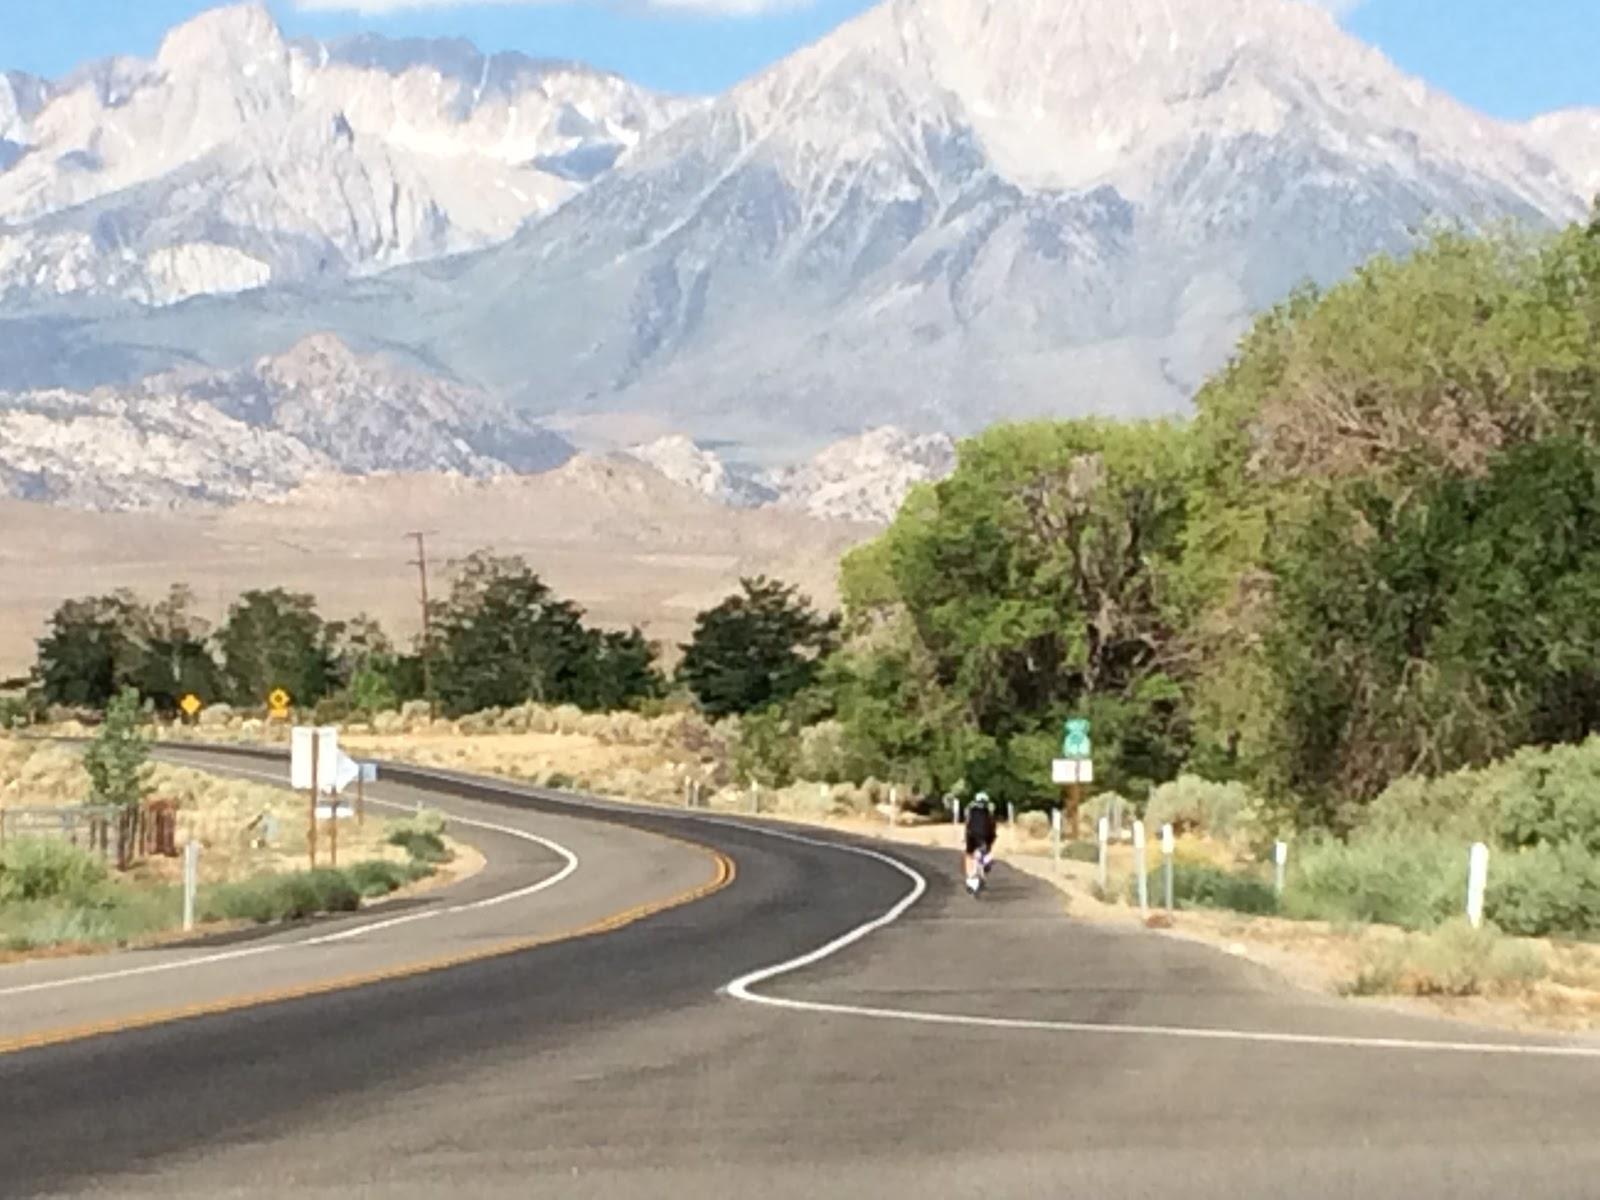 Climbing South Lake by bike - start - cyclist on road